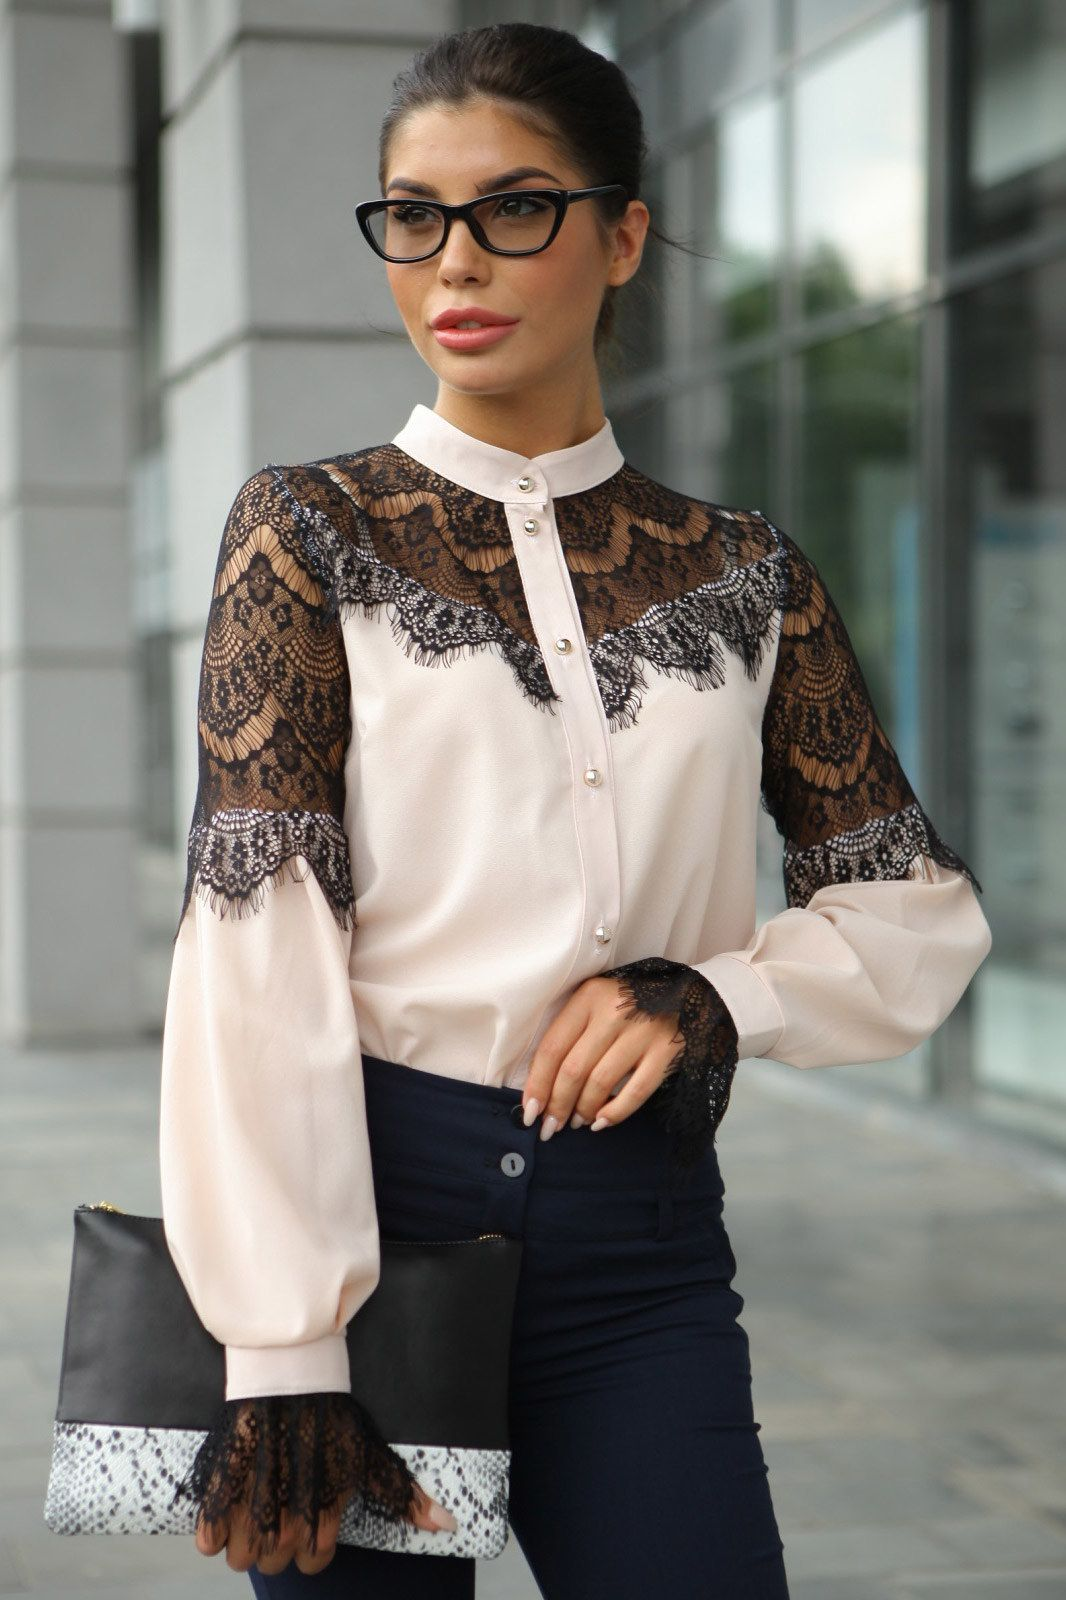 Bluza Zhenskaya Bluzy Rubashki Molegi Artikul 4031622 Fashion Blouses For Women Fashion Outfits